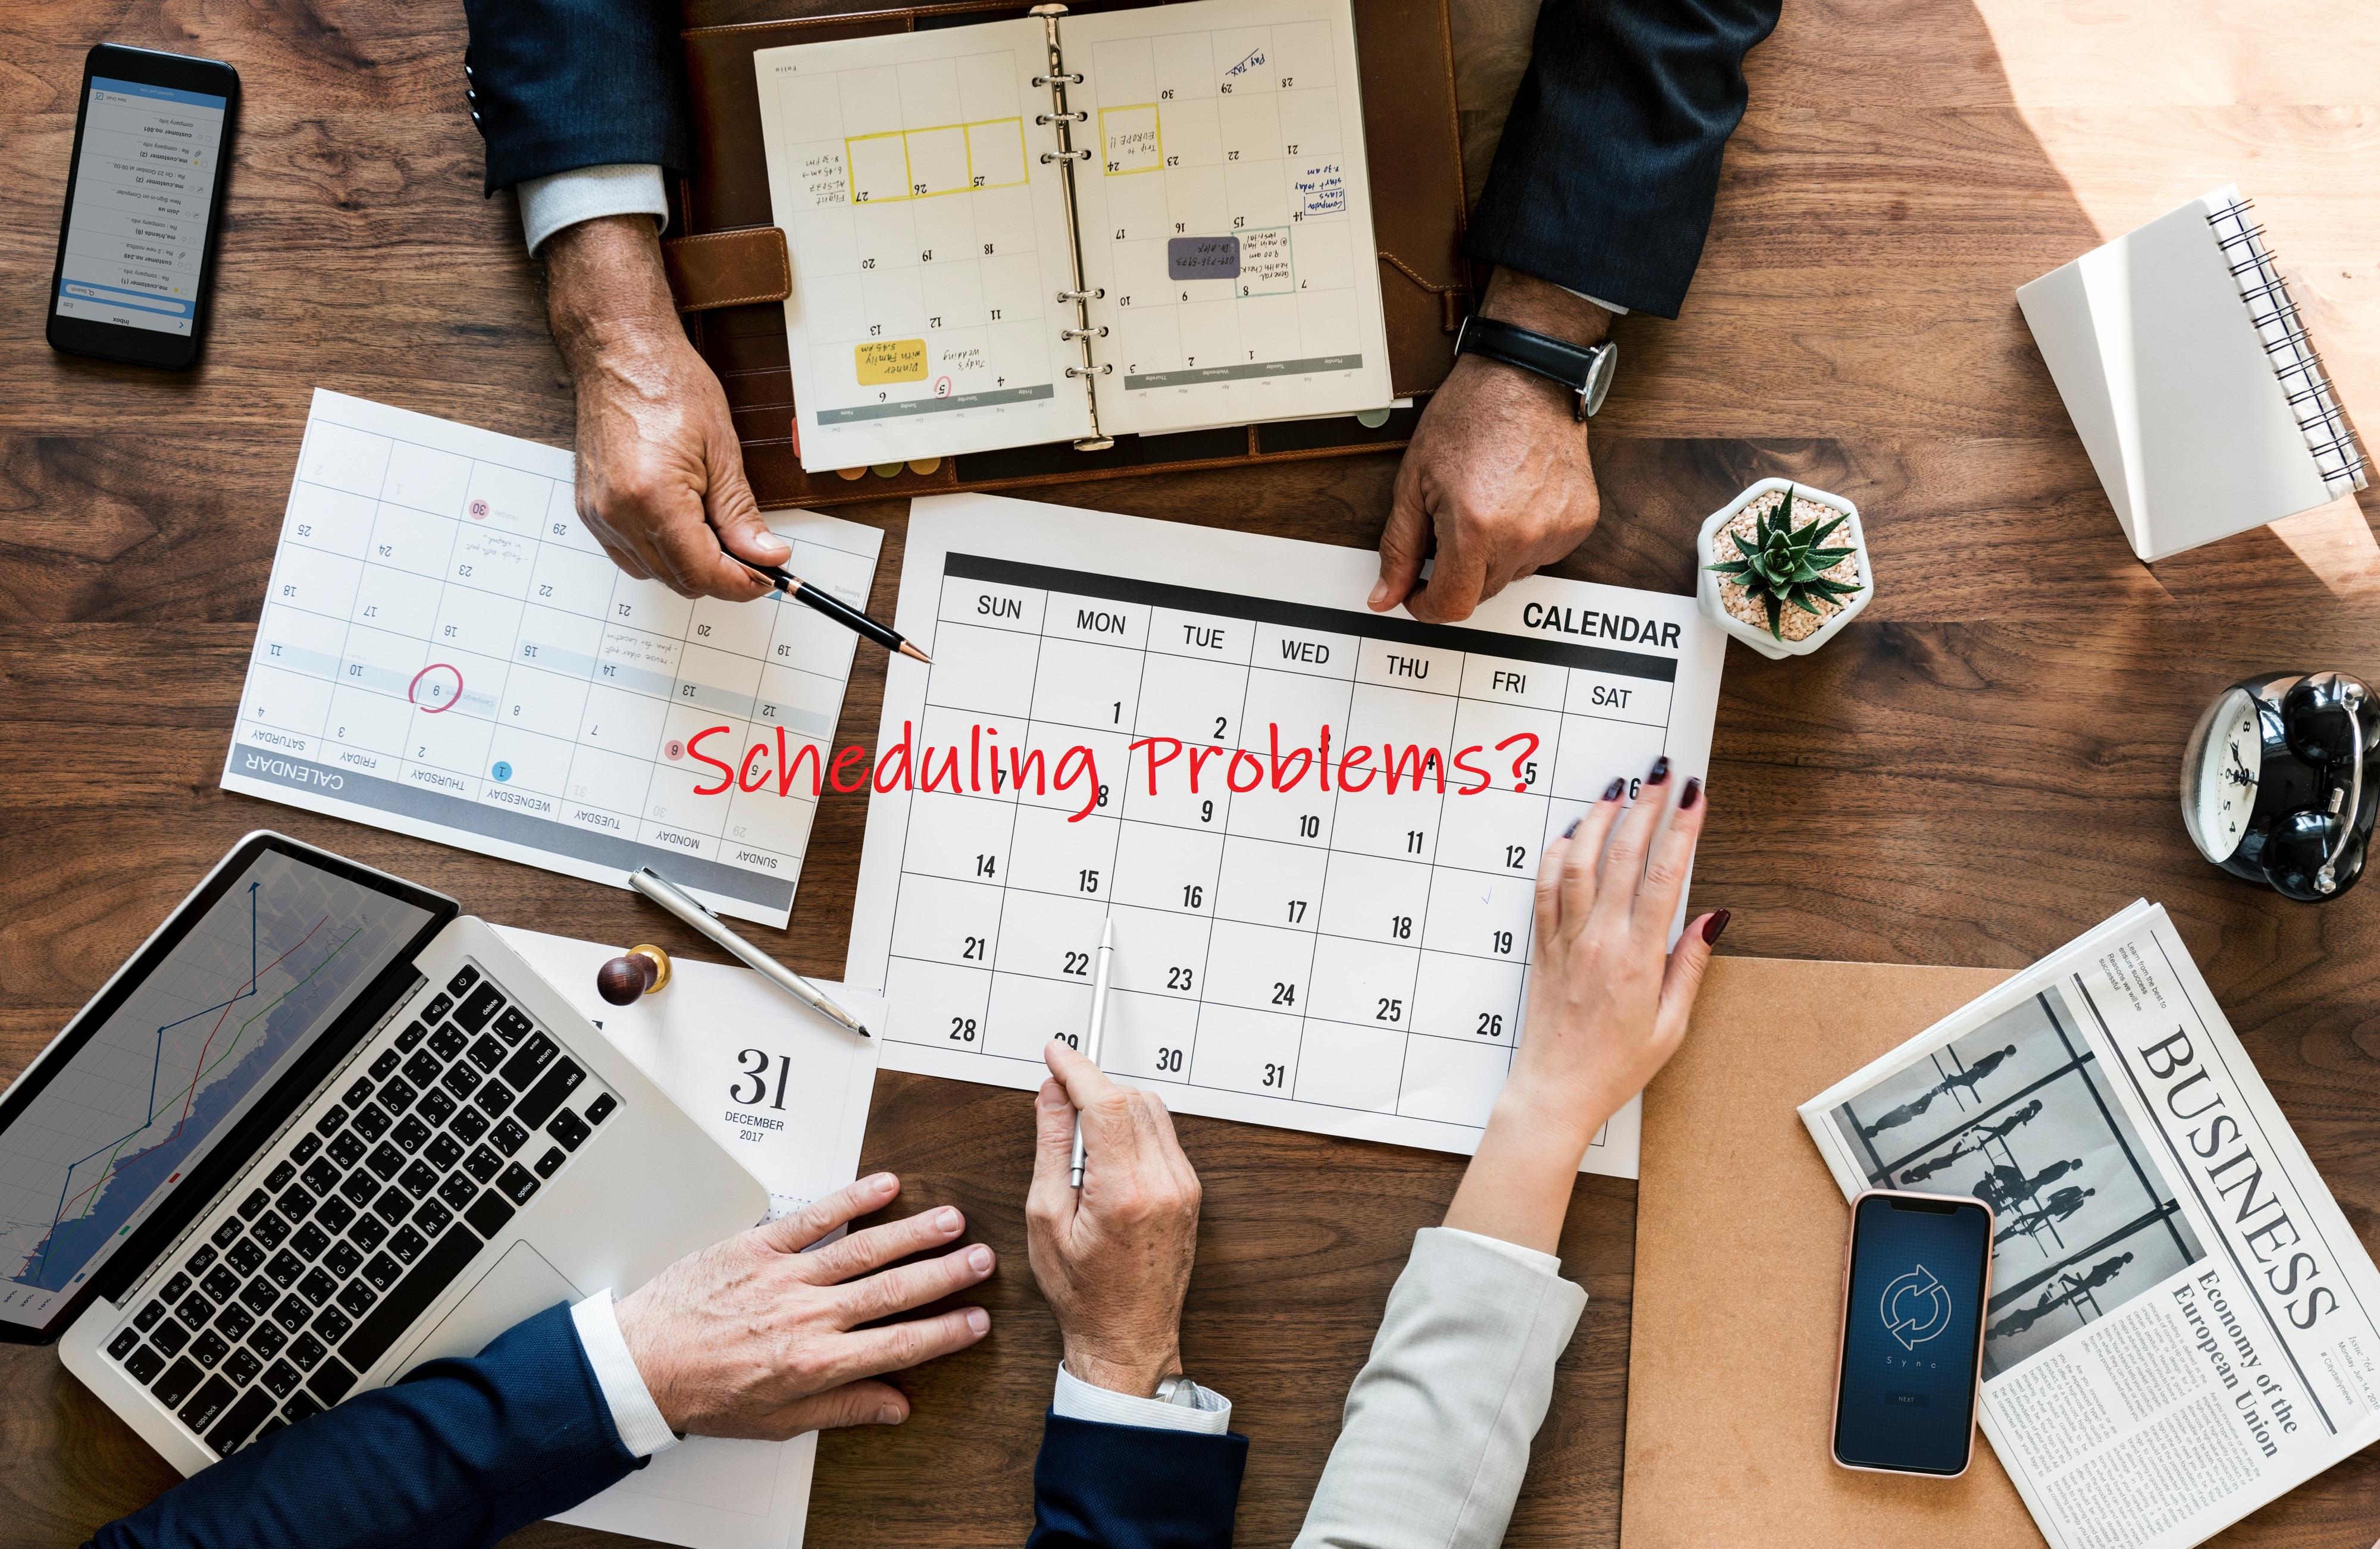 Scheduling Problems?